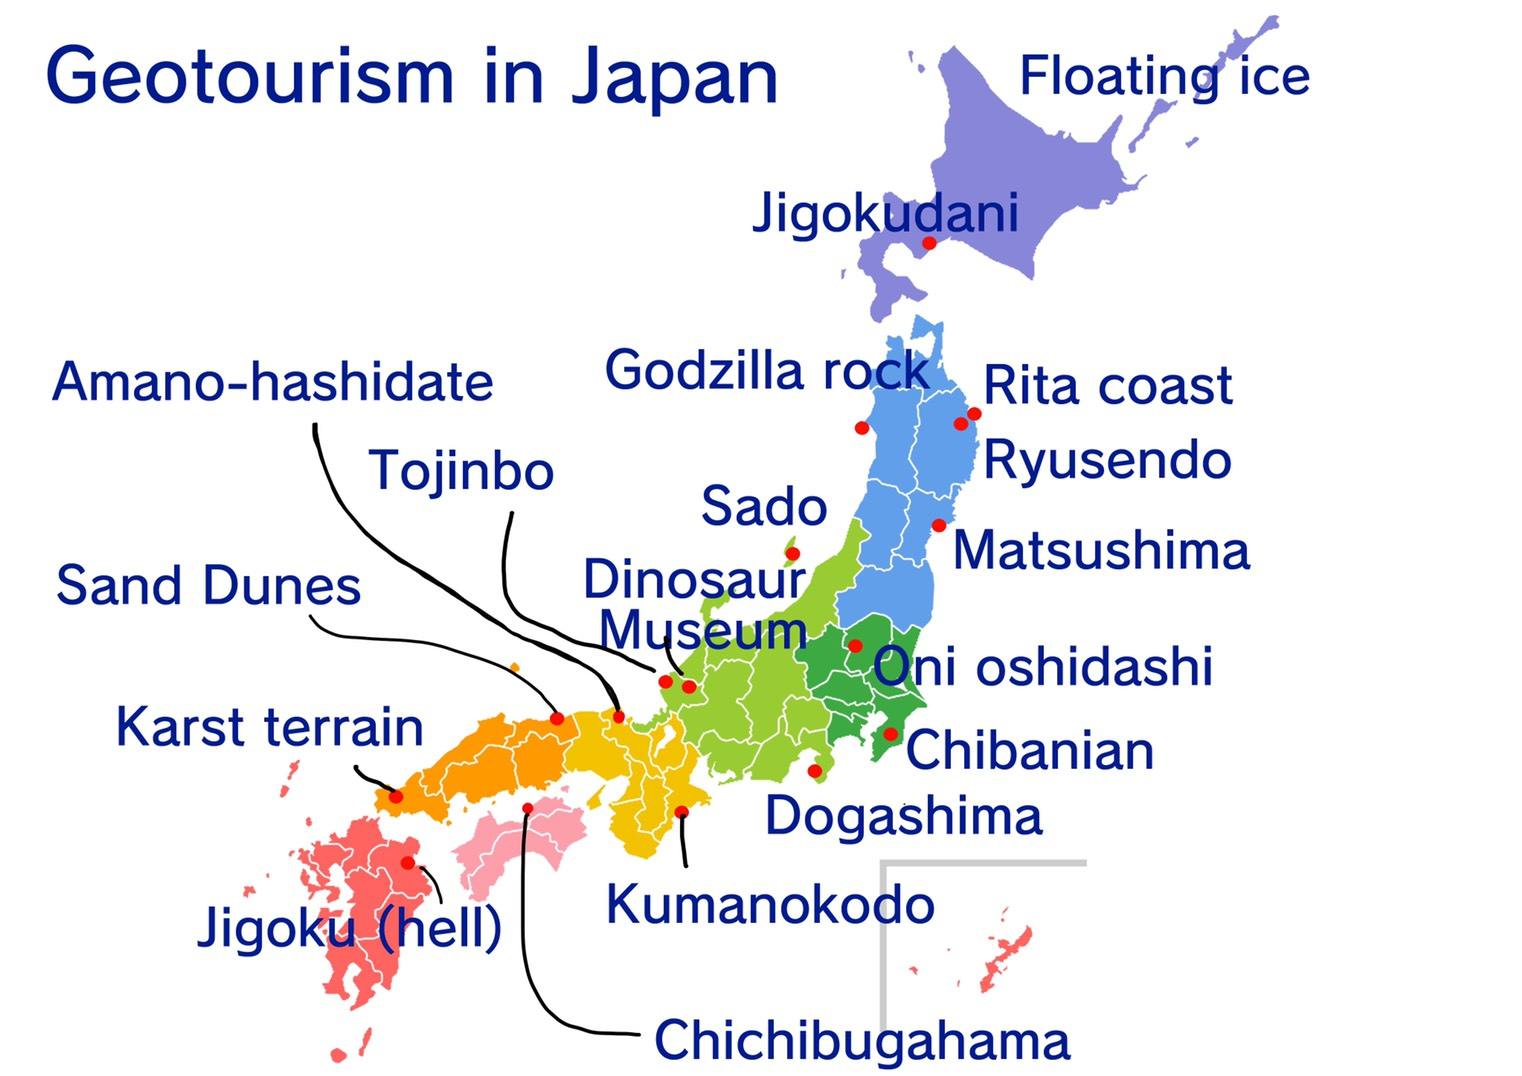 Japan geotourism